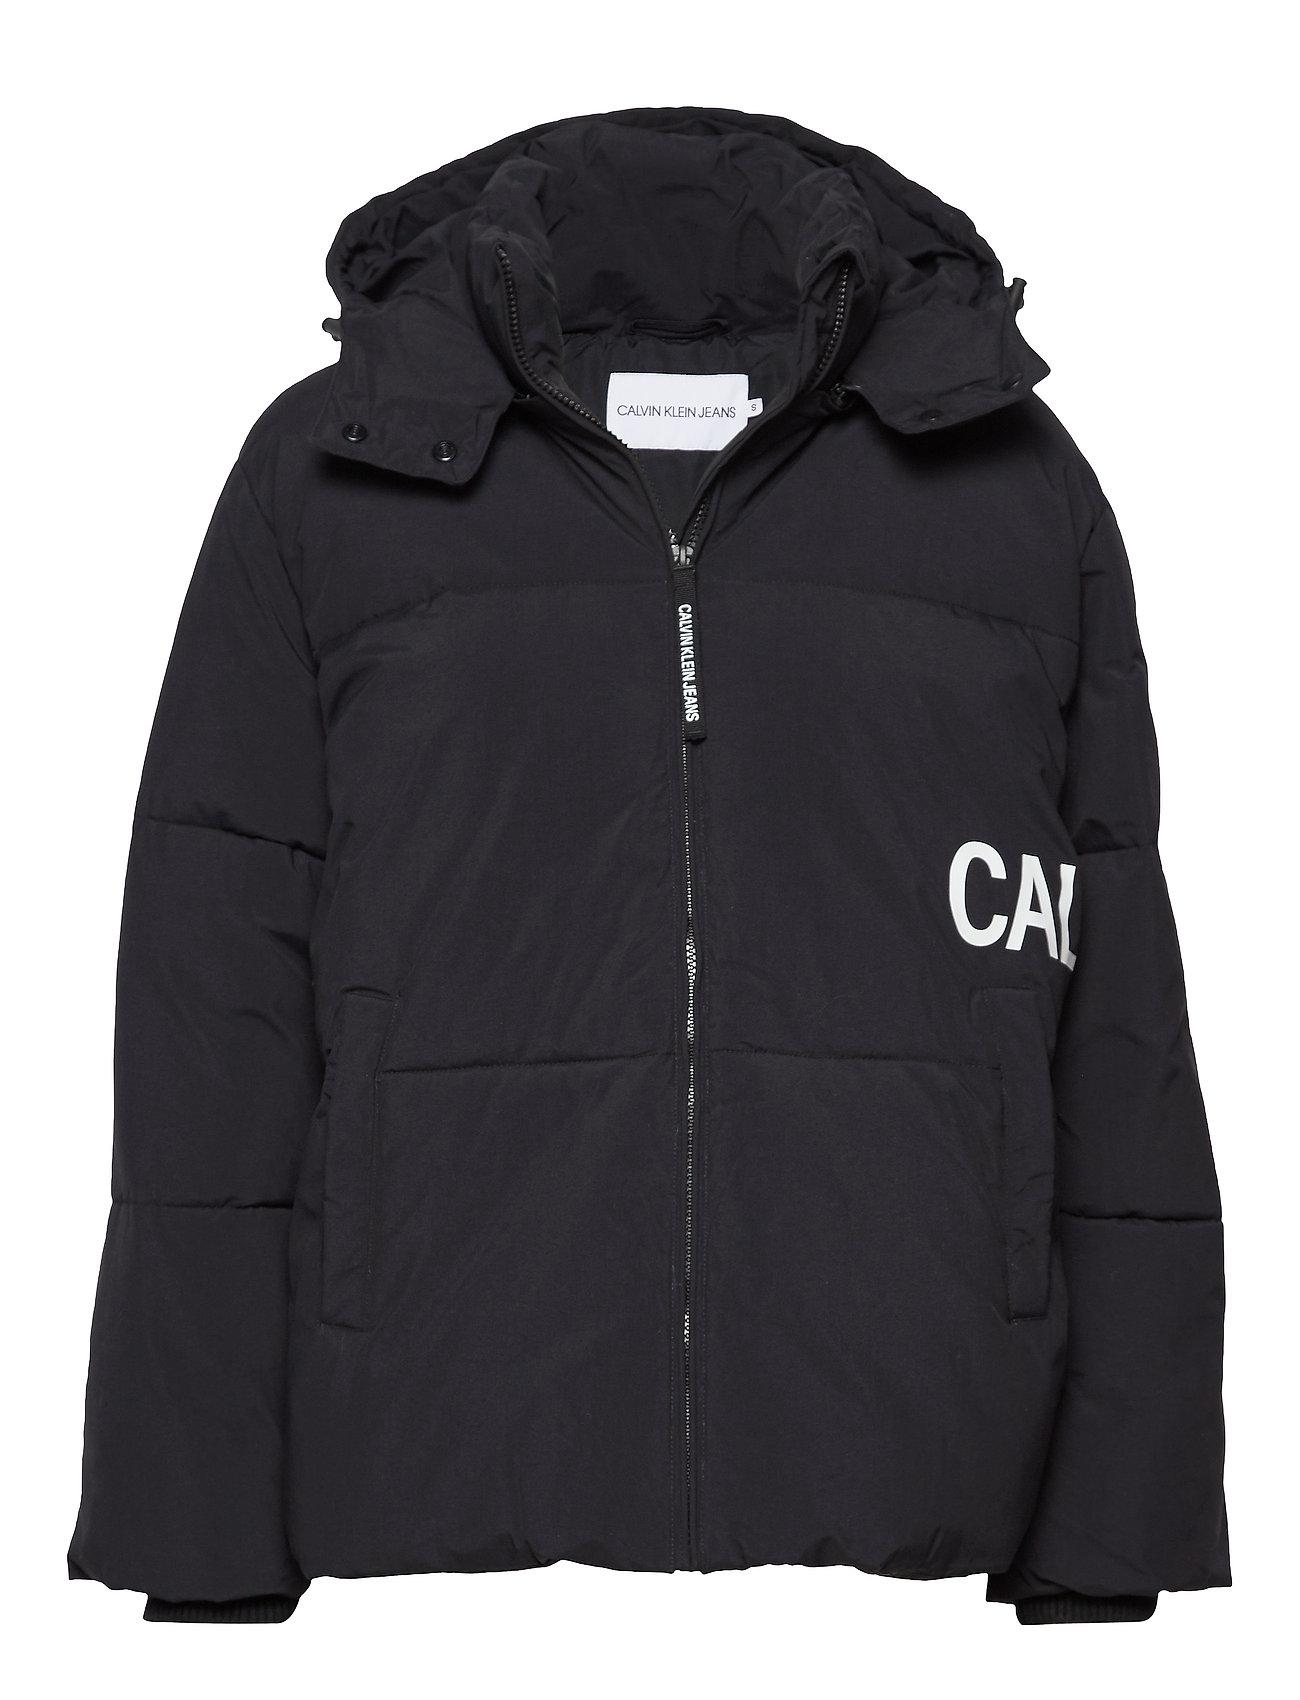 Calvin Klein Jeans OVERSIZED LOGO PUFFER - CK BLACK